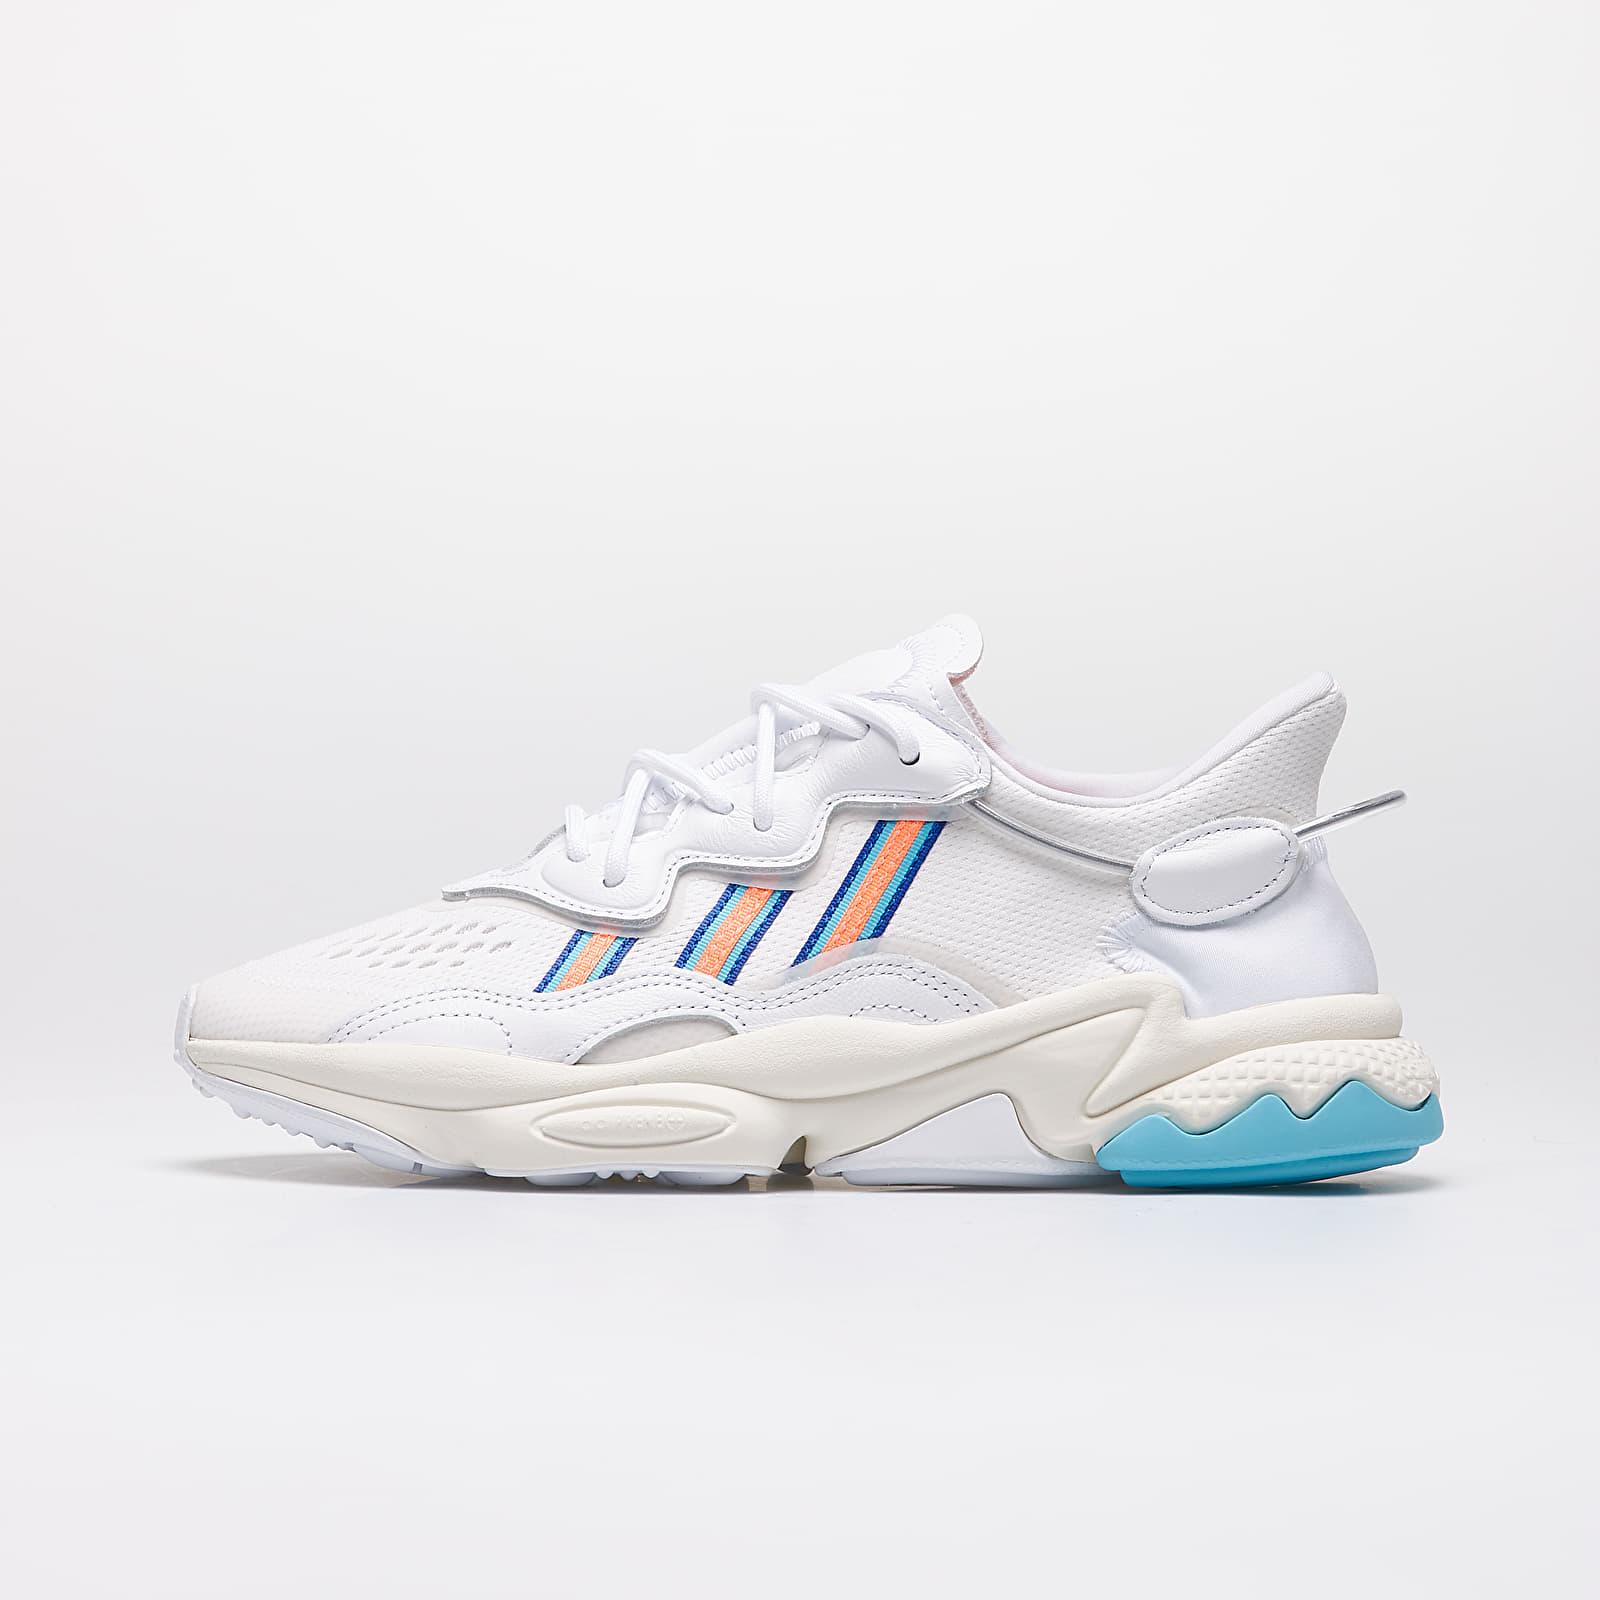 Frauen adidas Ozweego W Ftw White/ Signature Coral/ Blue Glow